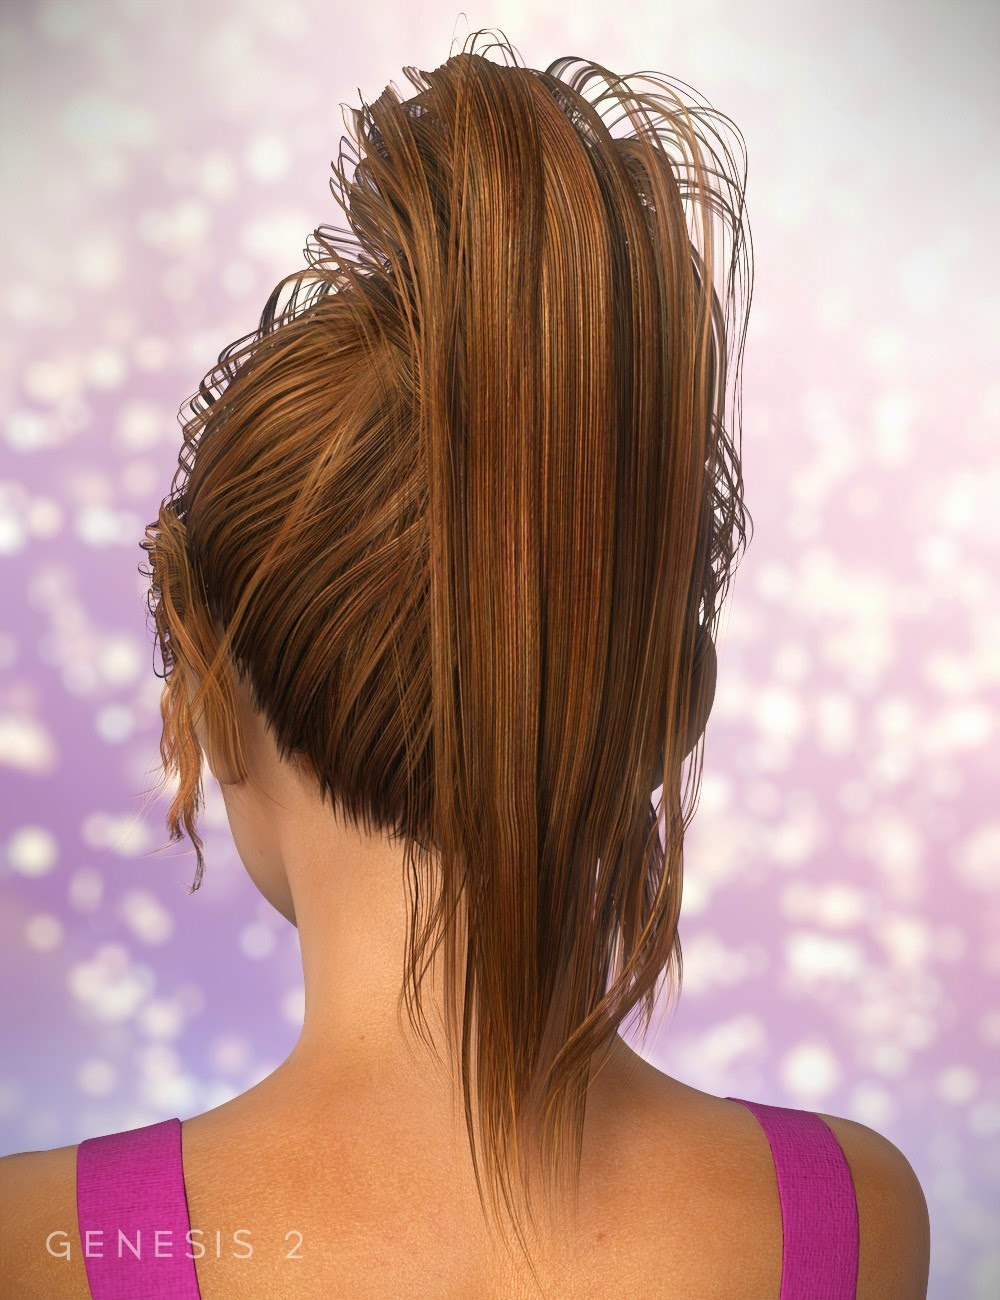 NJA Ponytail Hair for Genesis 2 Female